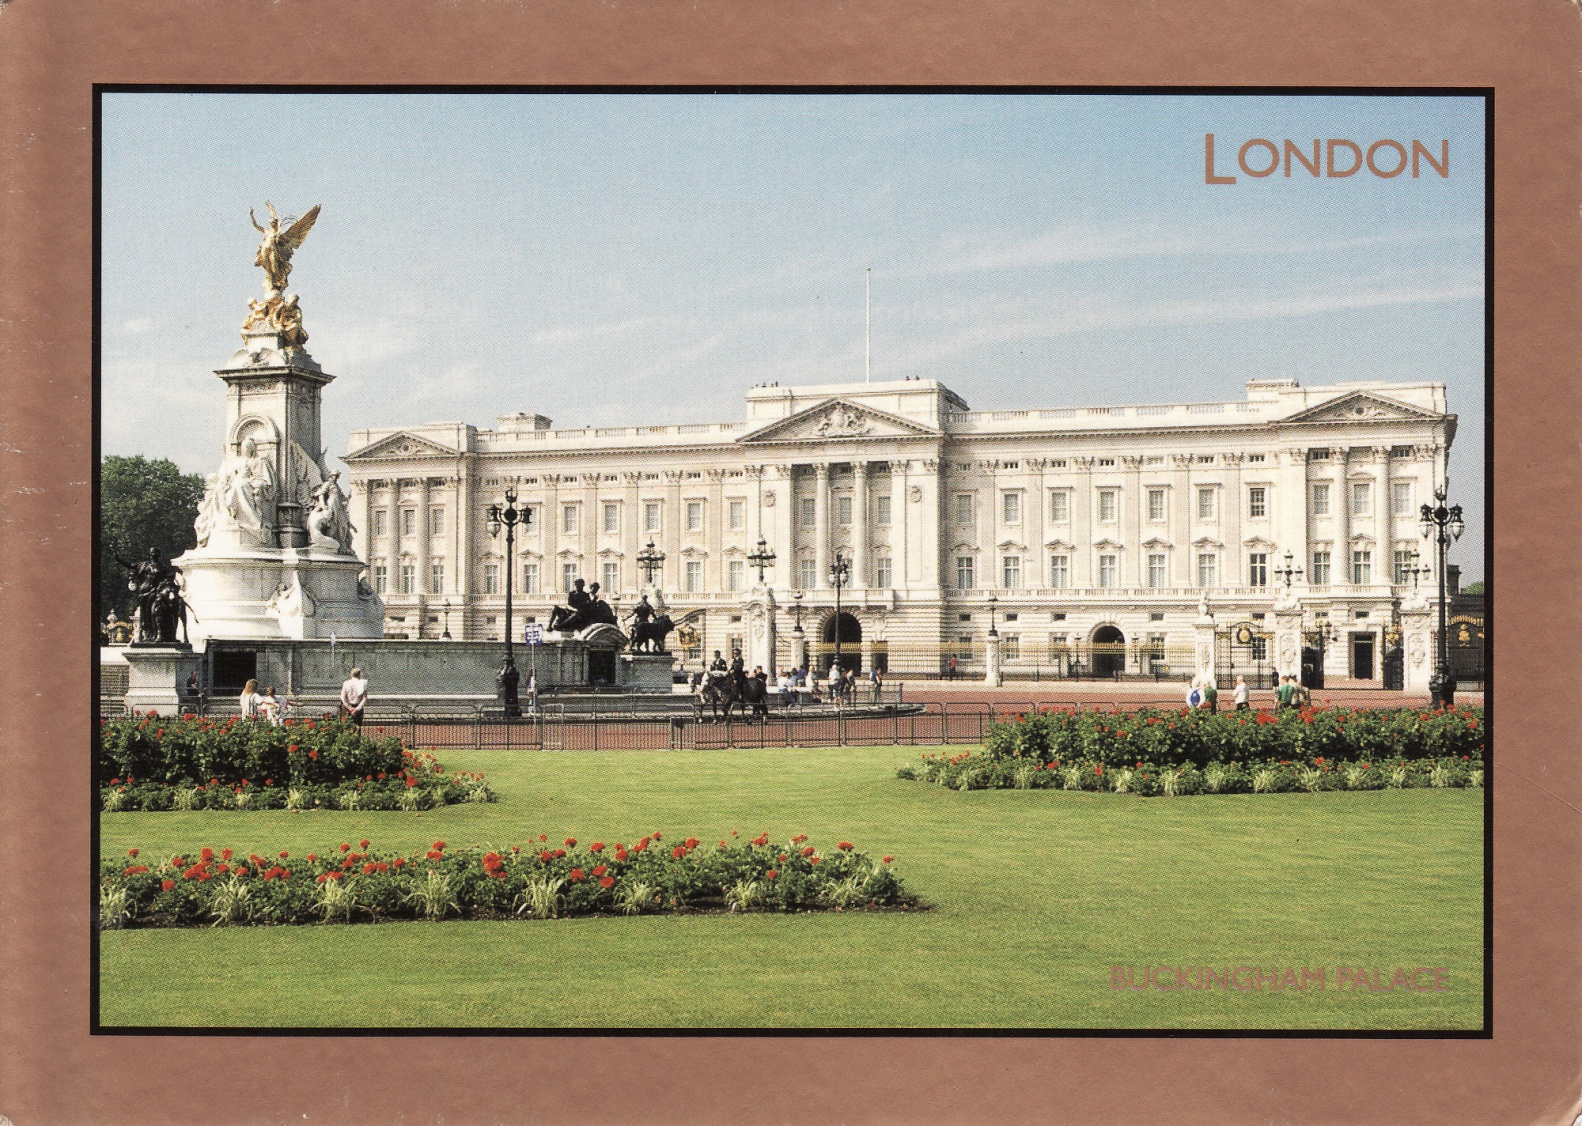 C:\Documents and Settings\Оля\Рабочий стол\ДОКУМЕНТЫ WORD\Школьная документация\Картинки Лондона\IMG_0003.jpg